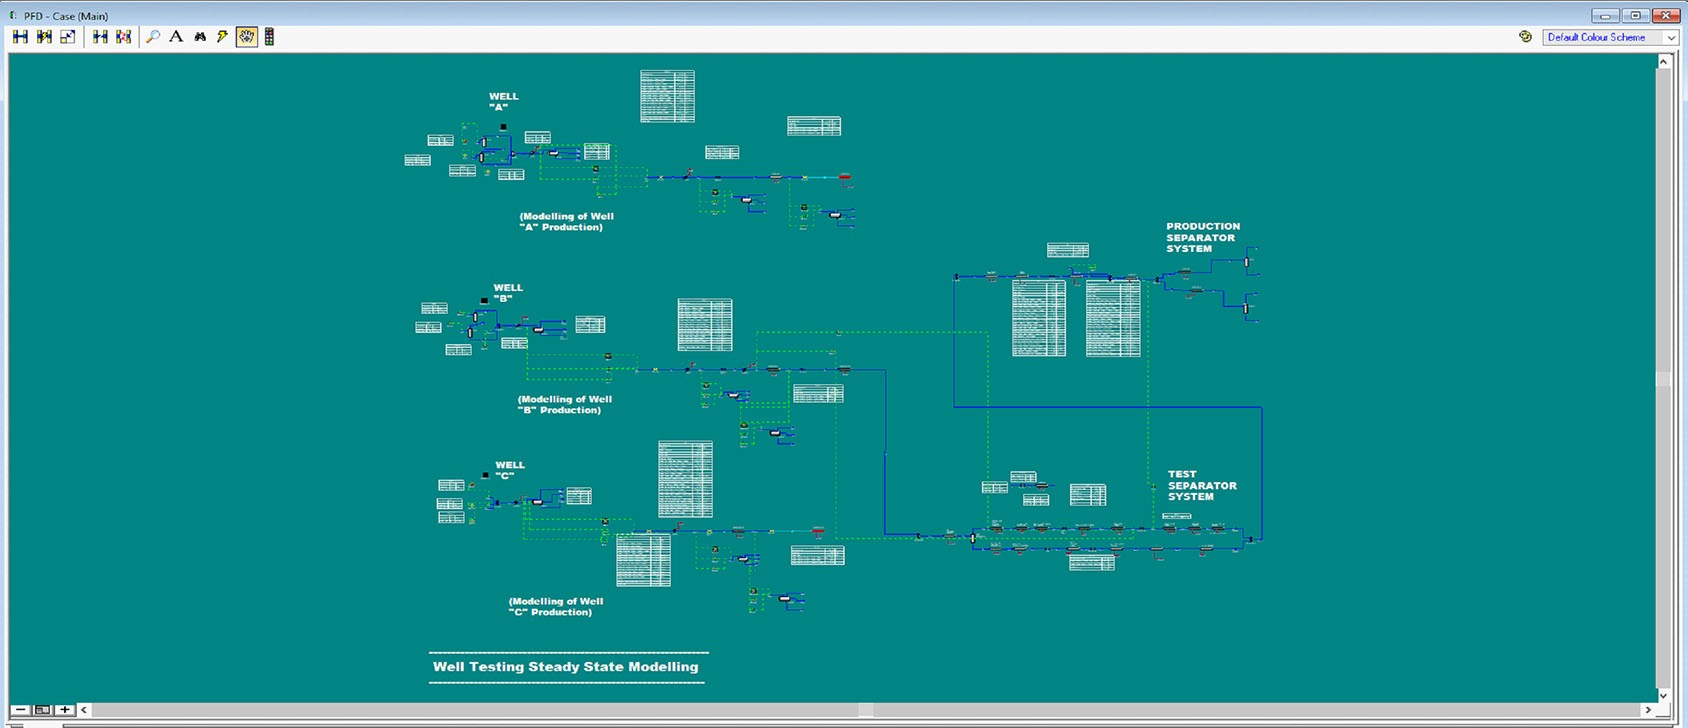 Pertrokon_Process_Engineering_1